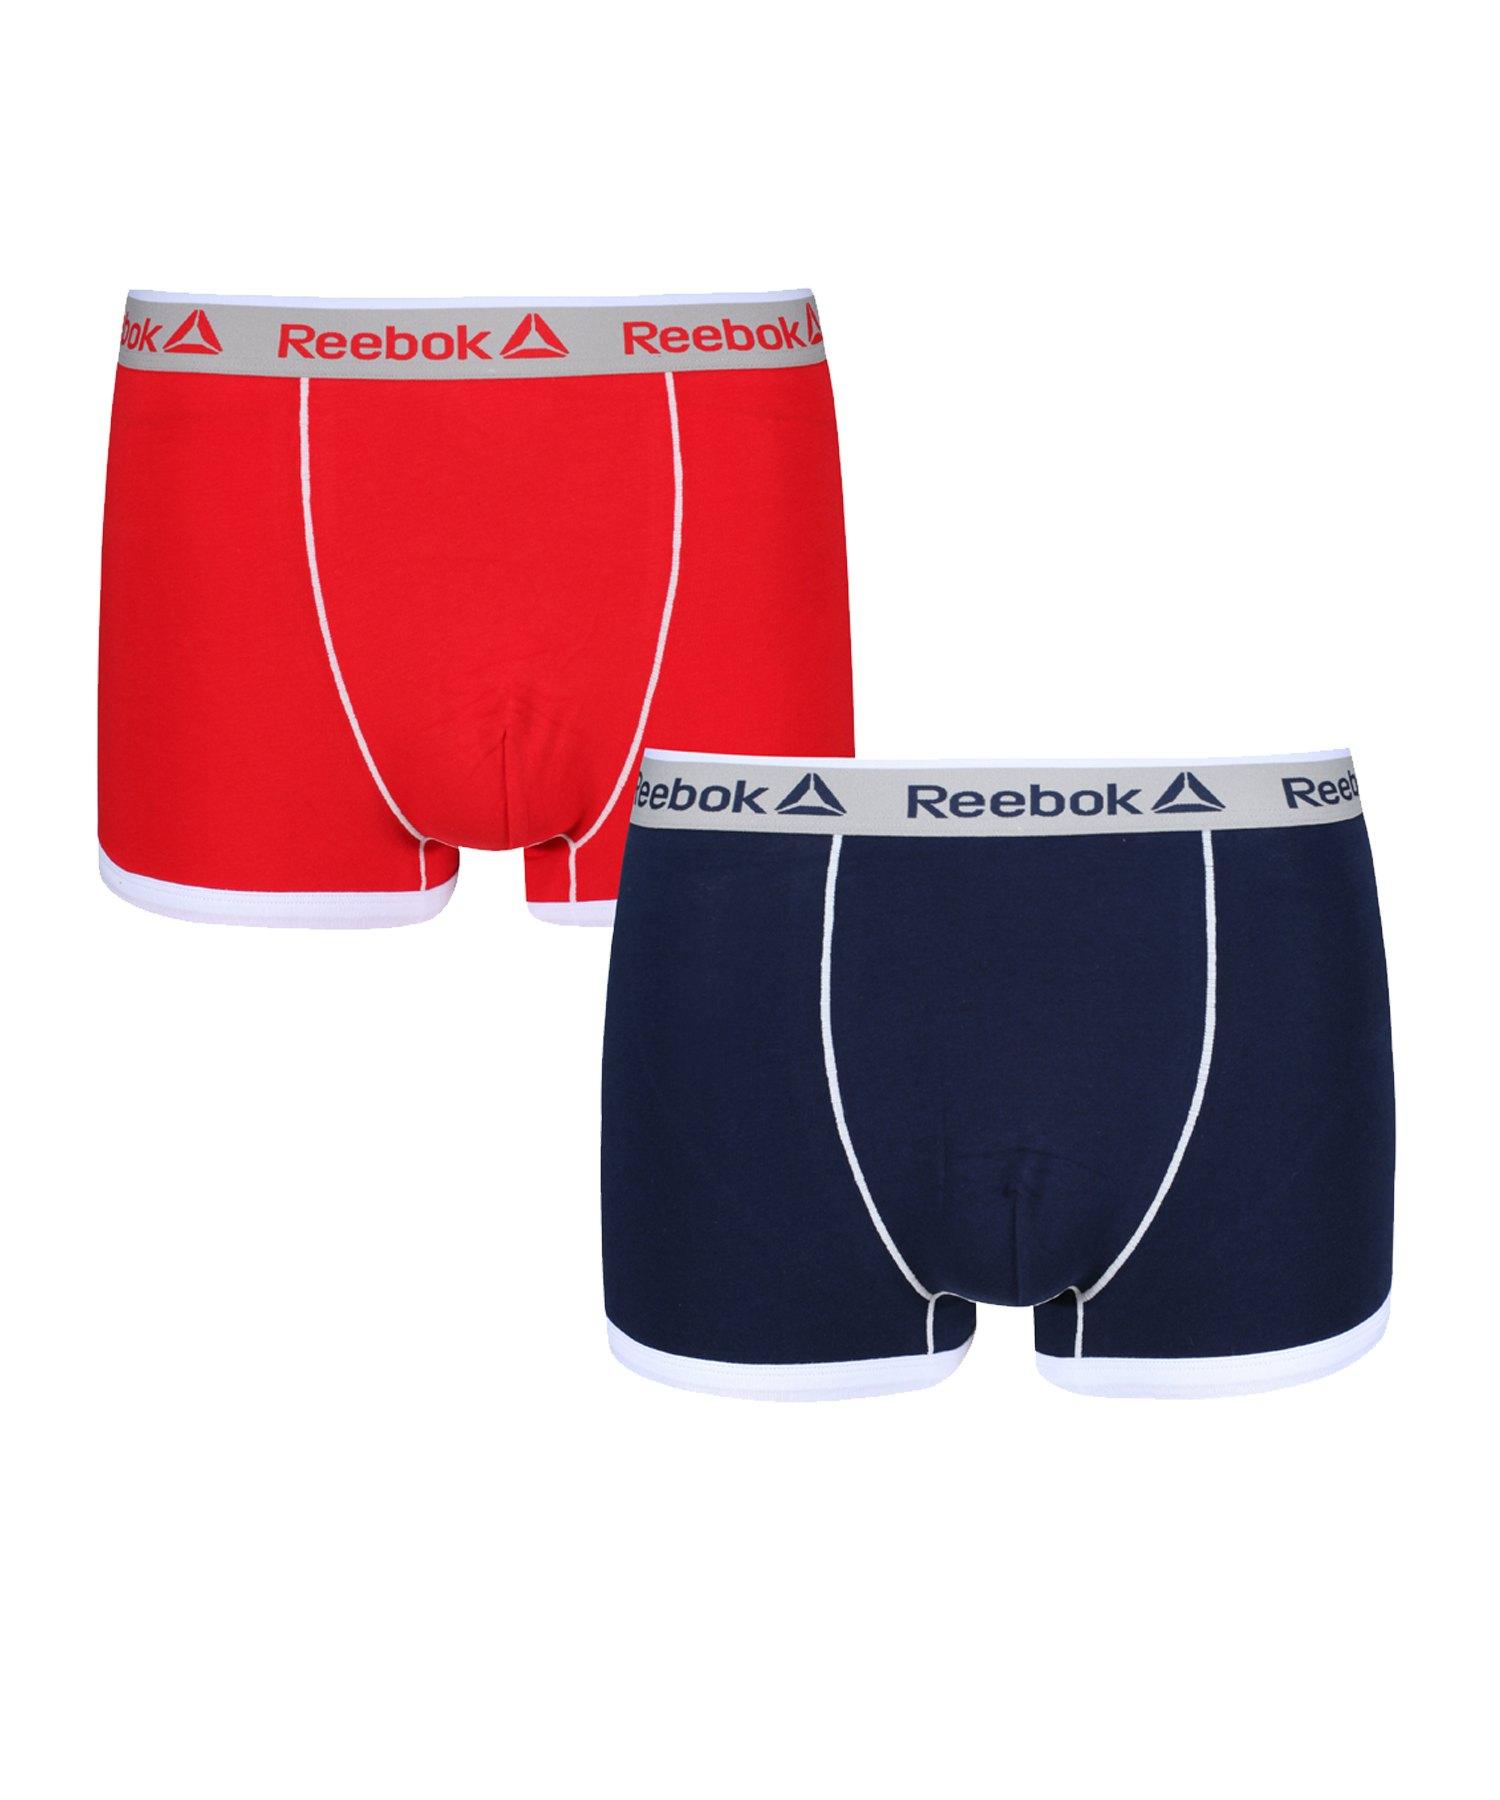 Reebok 2er Pack Trunk OLIVER Boxershort Blau und Rot - blau